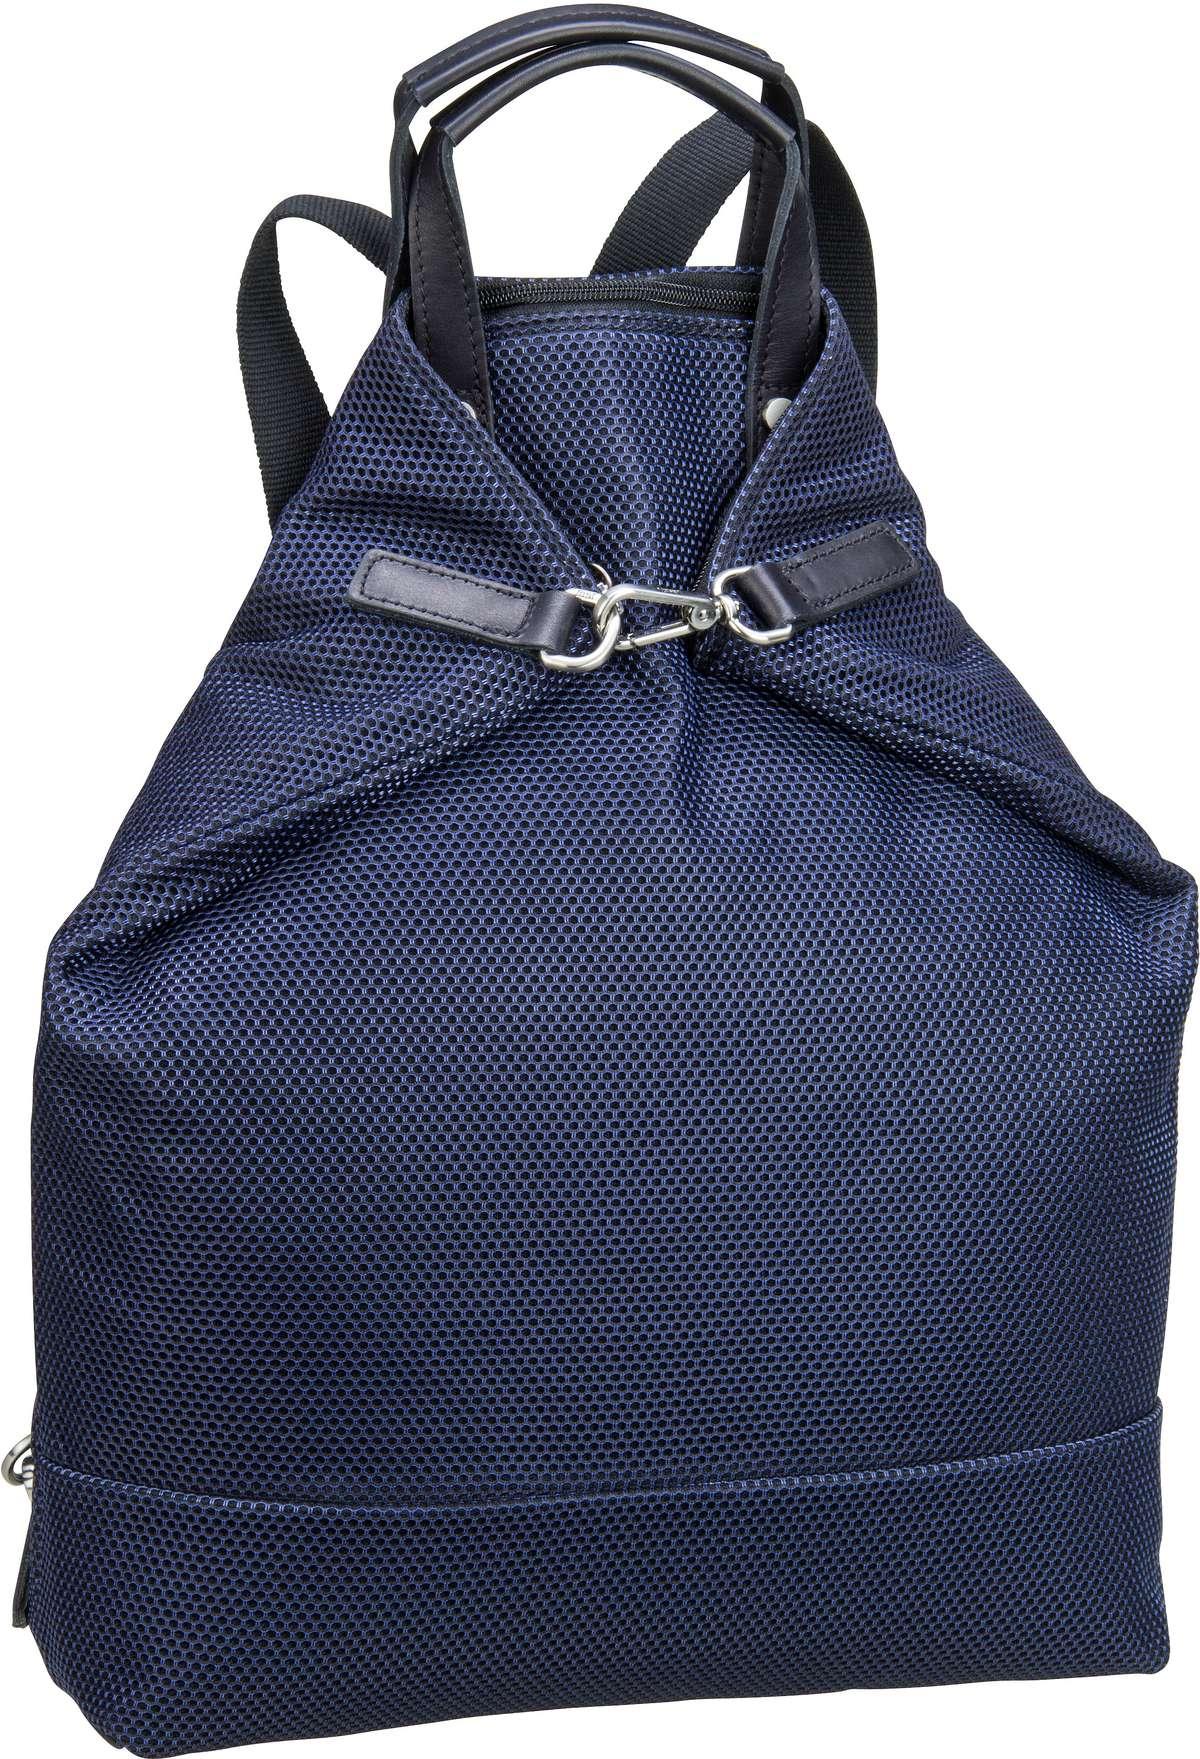 Rucksack / Daypack Mesh 6170 X-Change 3in1 Bag M Blue